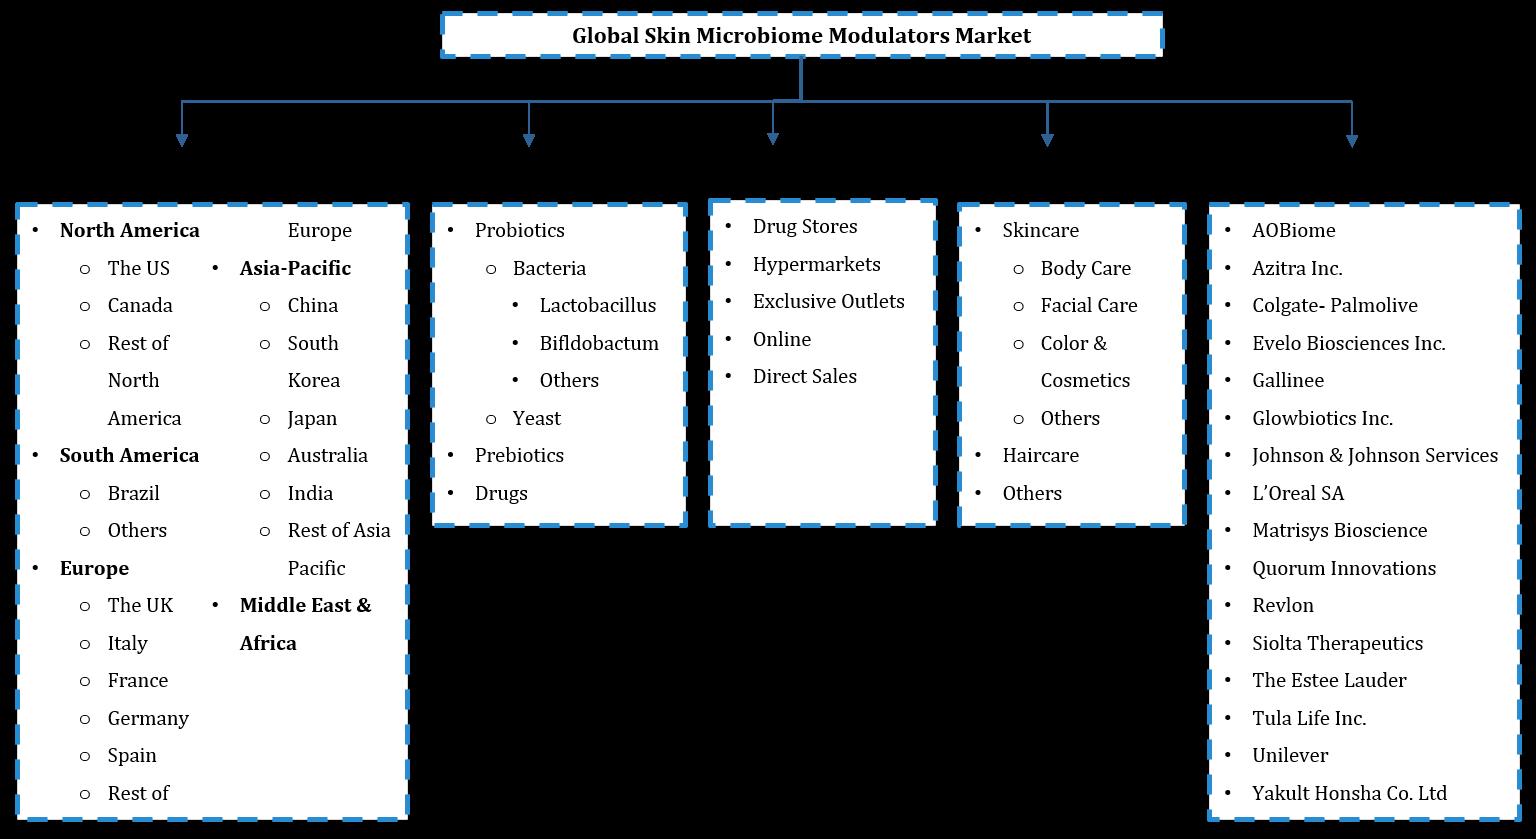 Global Skin Microbiome Modulators Market Segmentation